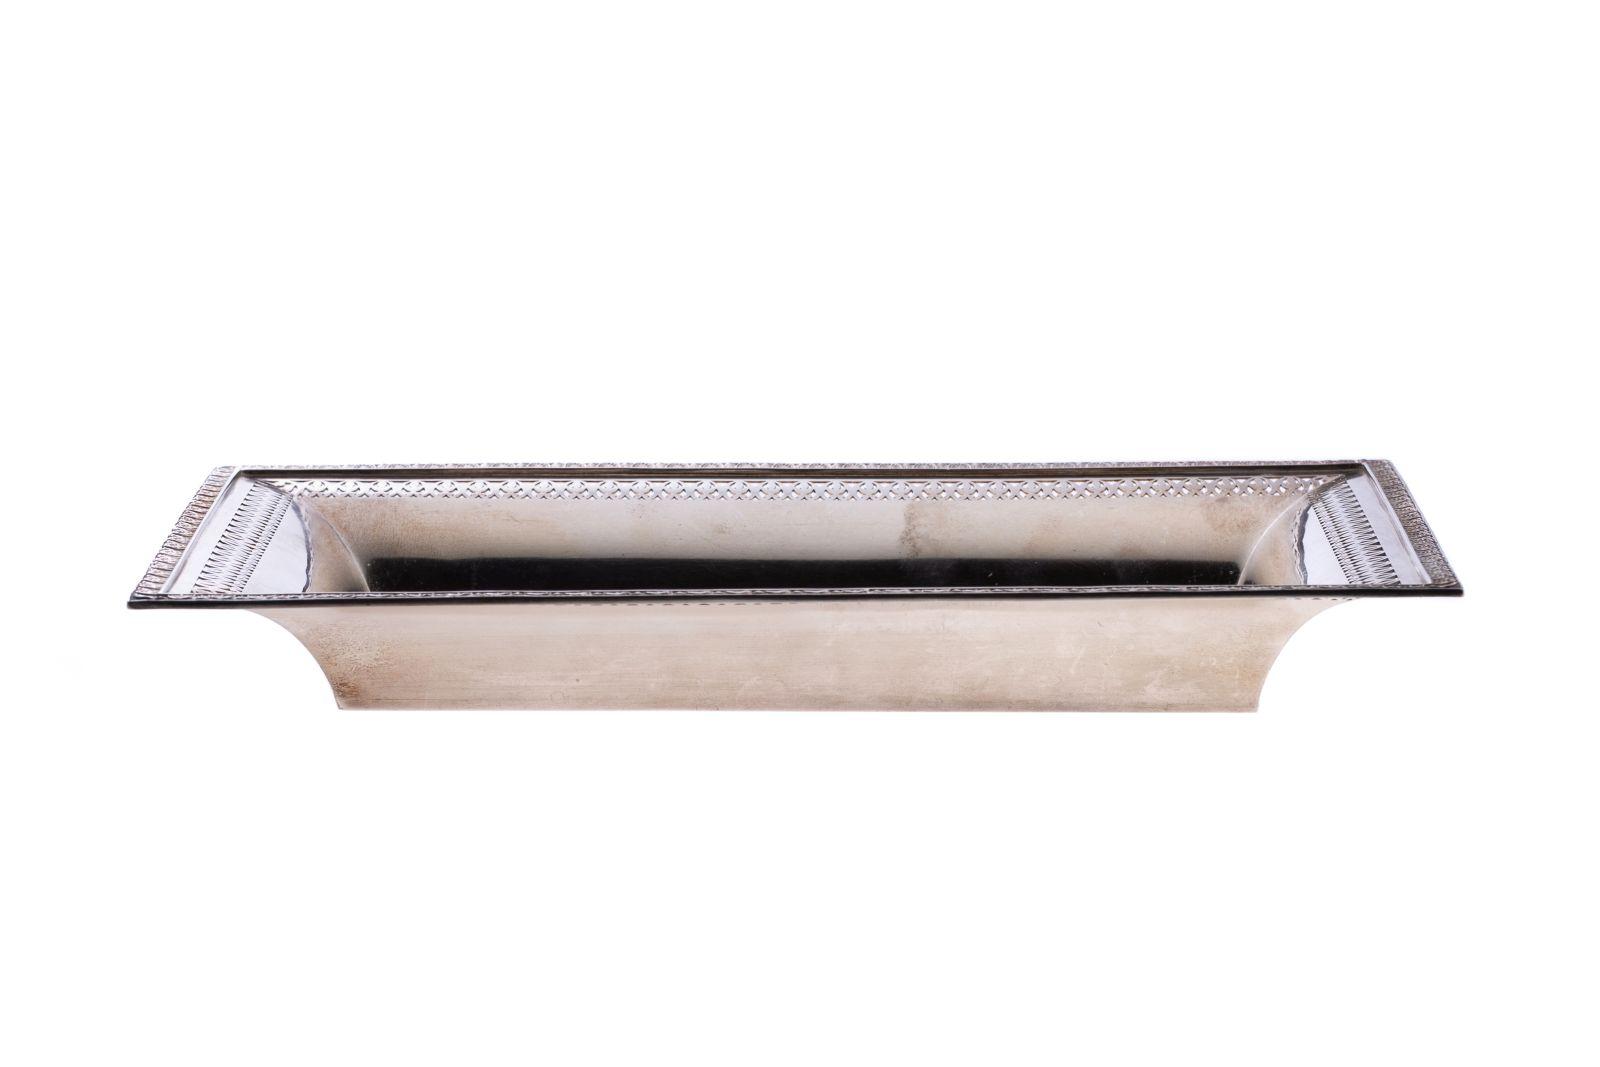 #124 Square bowl | Viereckige Schale Image